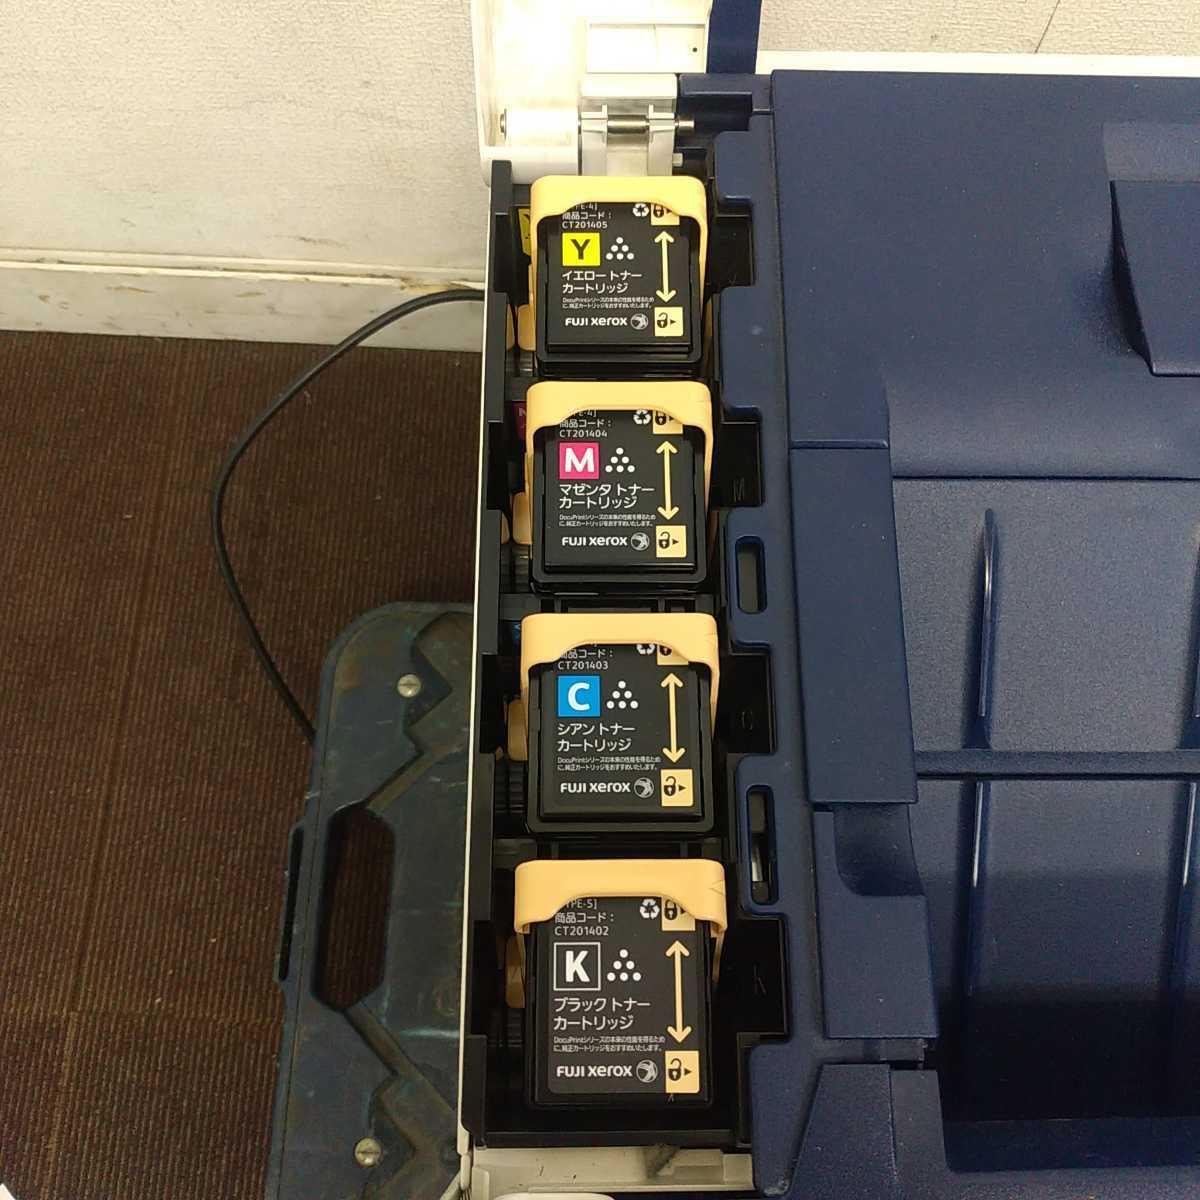 FUJI XEROX DocuPrint C3350 レーザープリンター 通電確認済み 現状品 プリンター 格安売り切りスタート☆_画像5